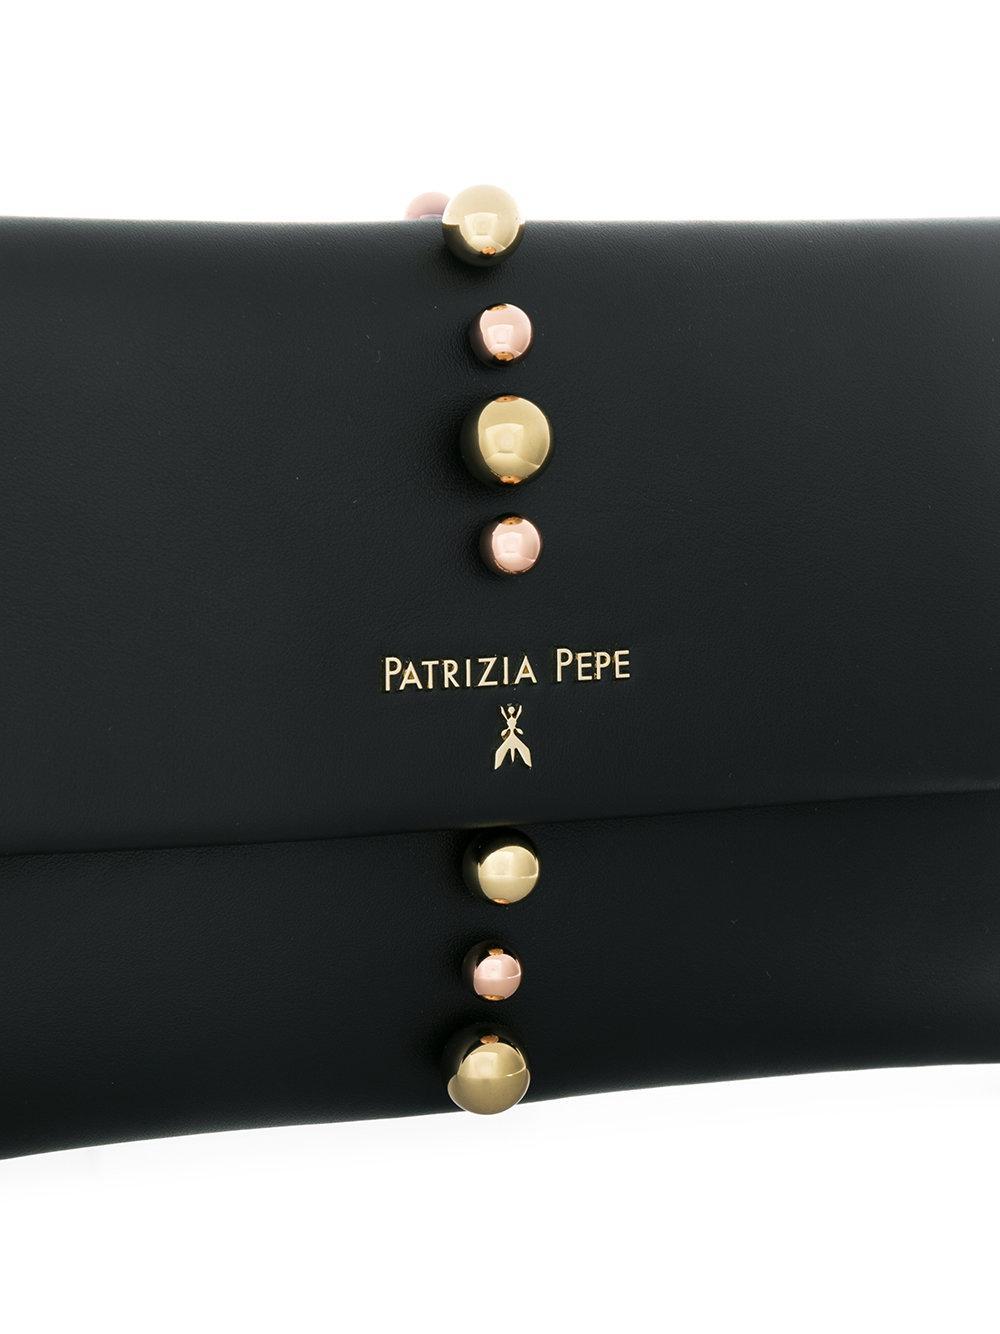 b400cfa298 Patrizia Pepe Studded Clutch Bag in Black - Lyst